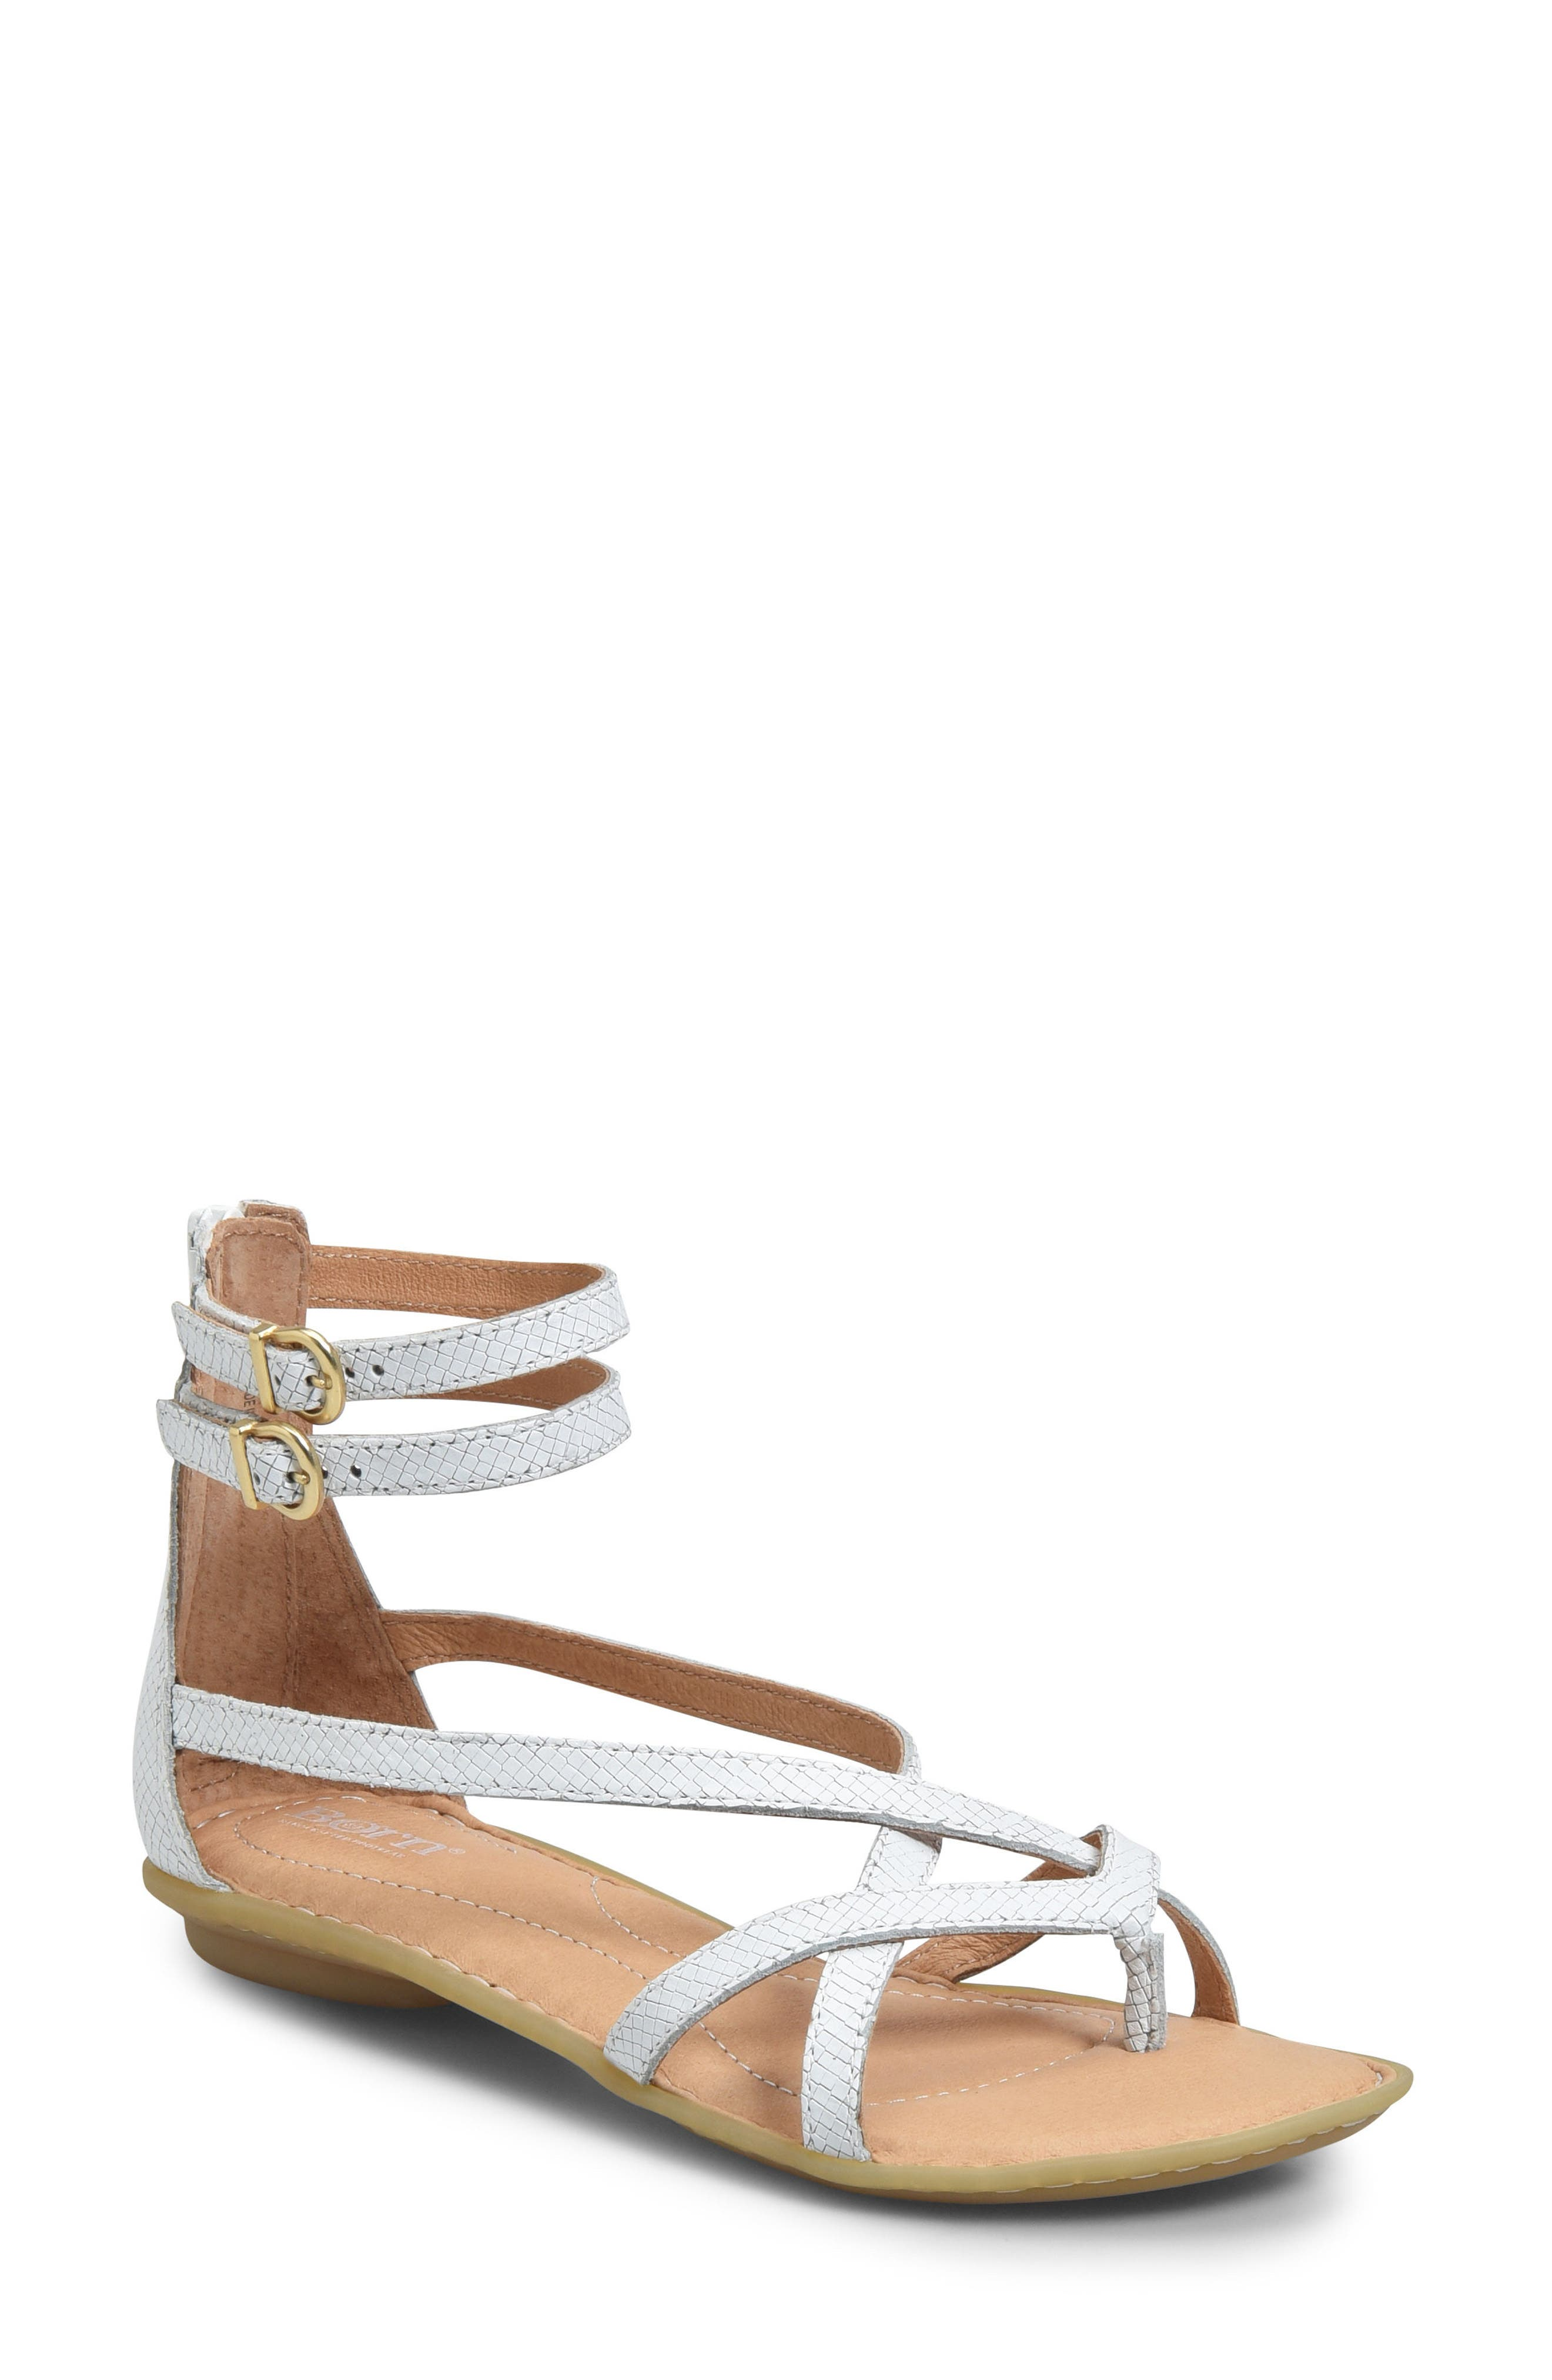 Mai Gladiator Sandal,                             Main thumbnail 1, color,                             White Leather